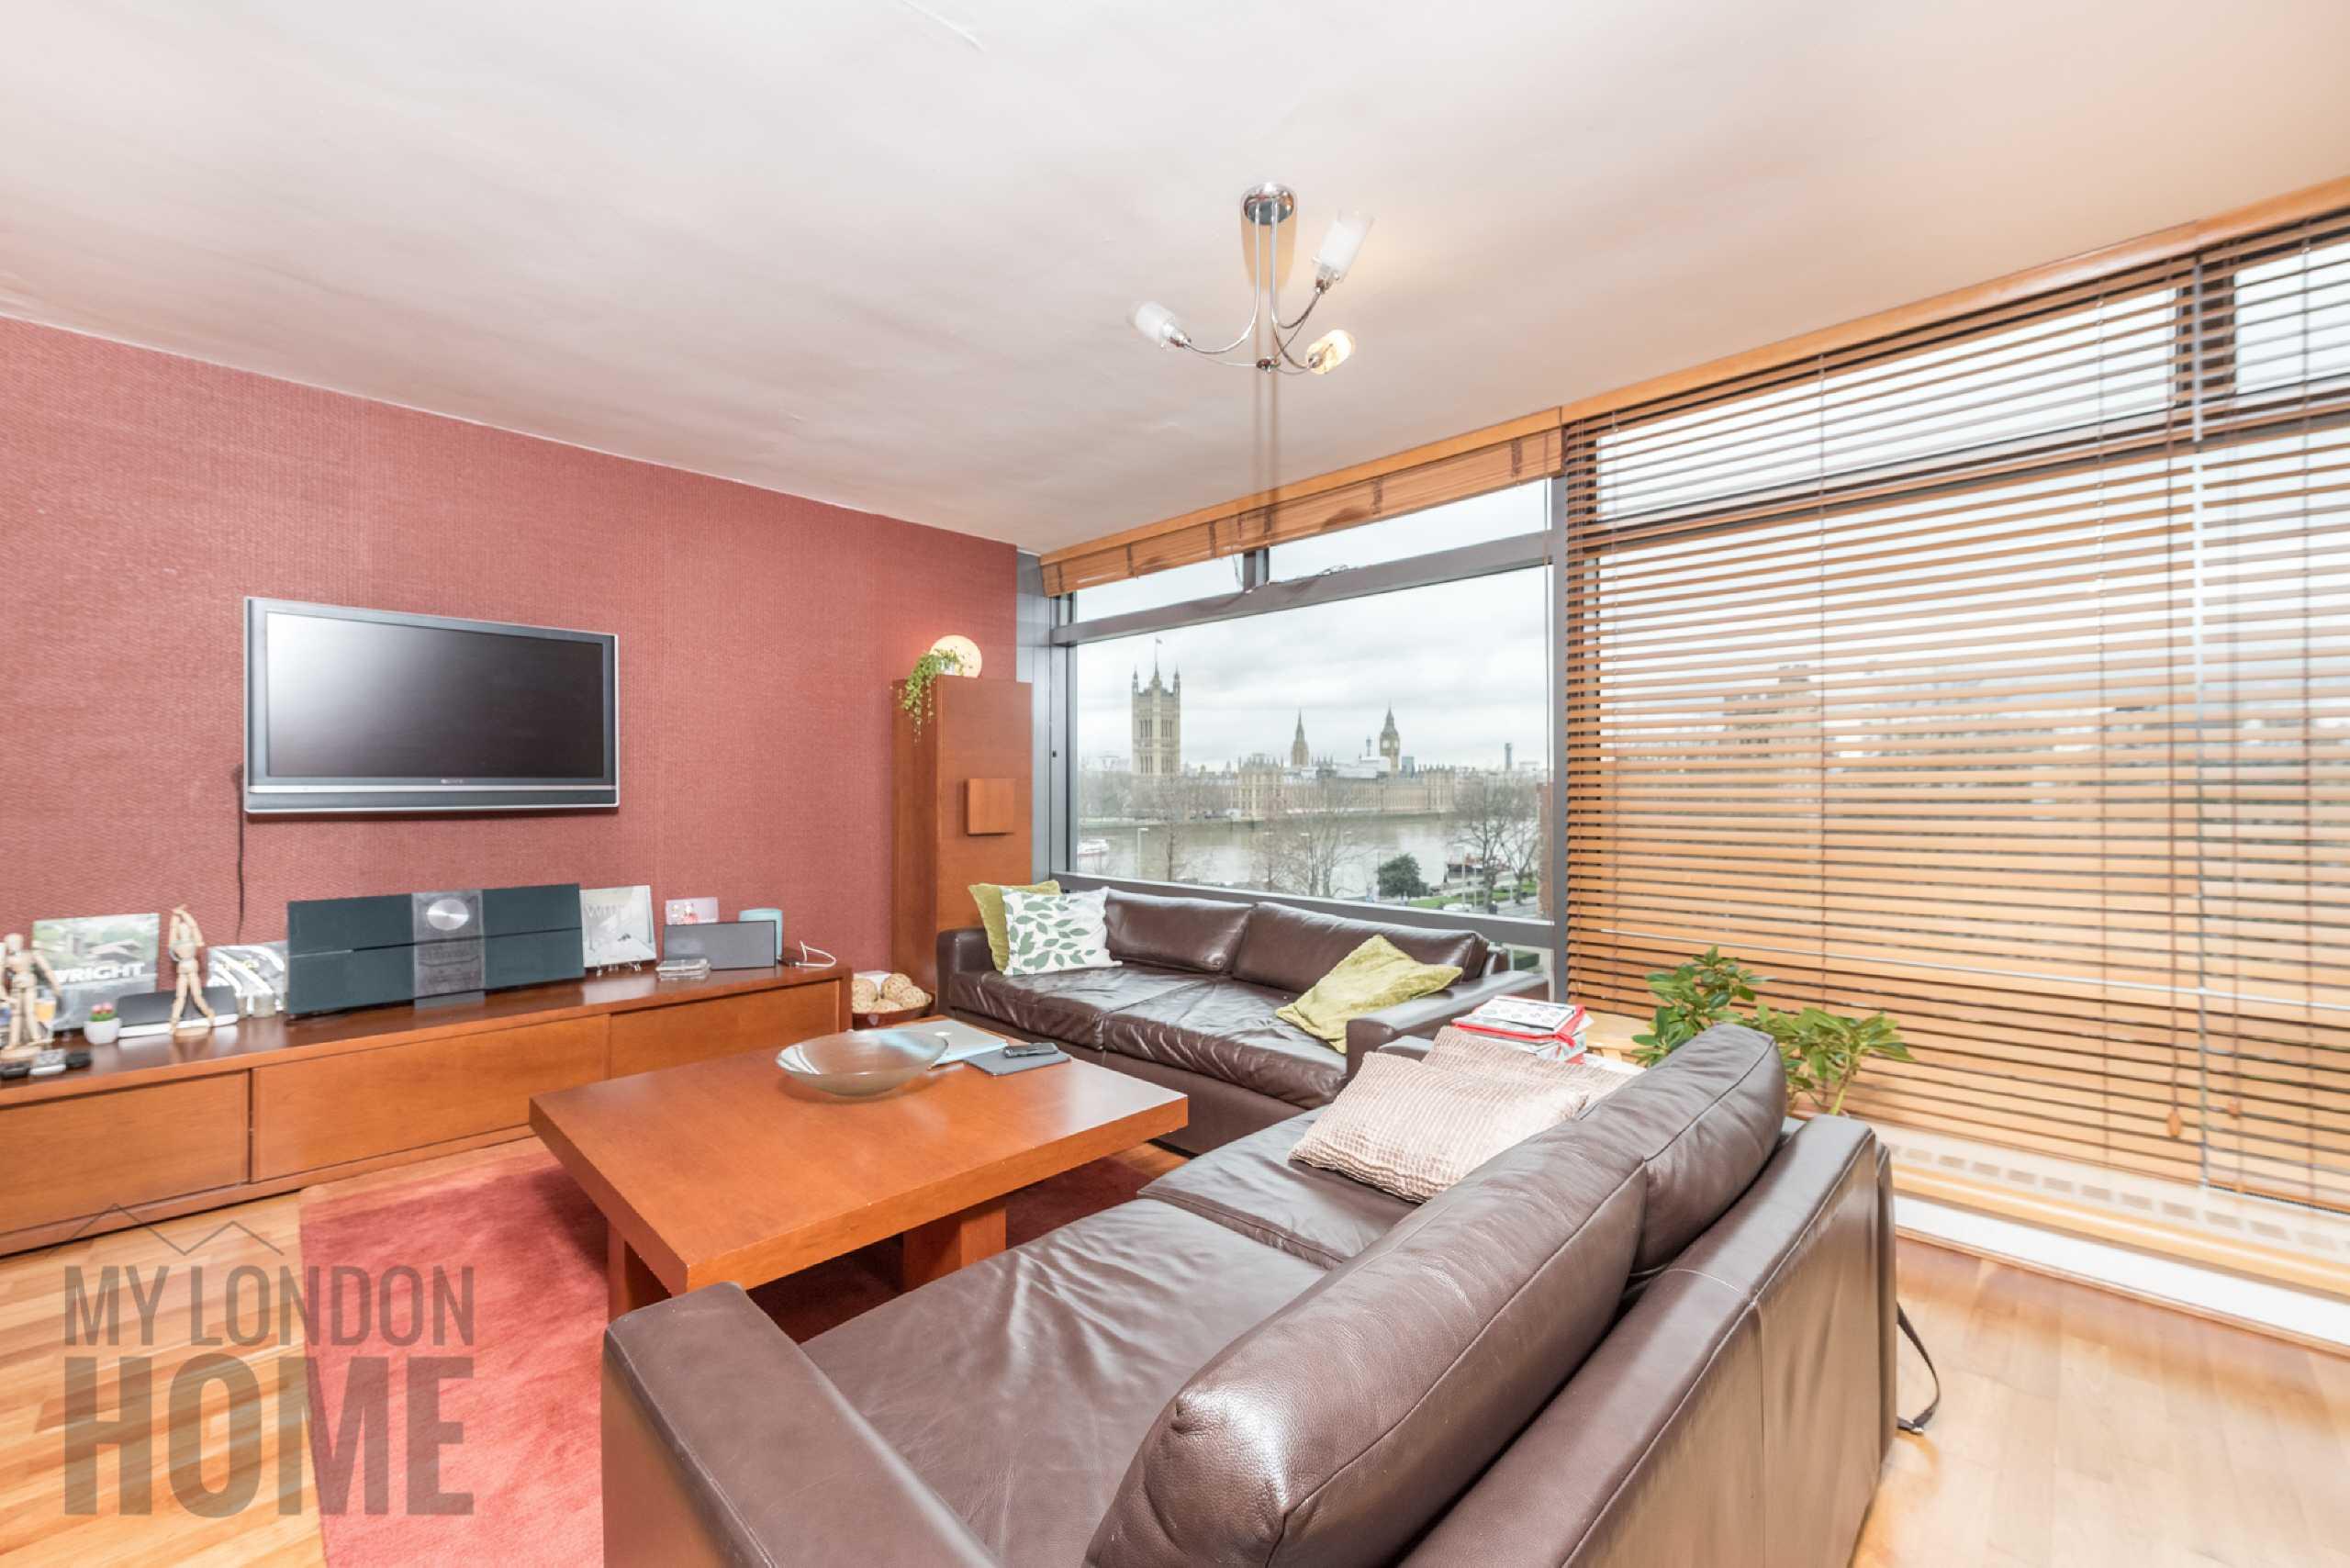 2 Bedroom Flat For Sale In Parliament View, 1 Albert Embankment, Lambeth,  SE1 , London